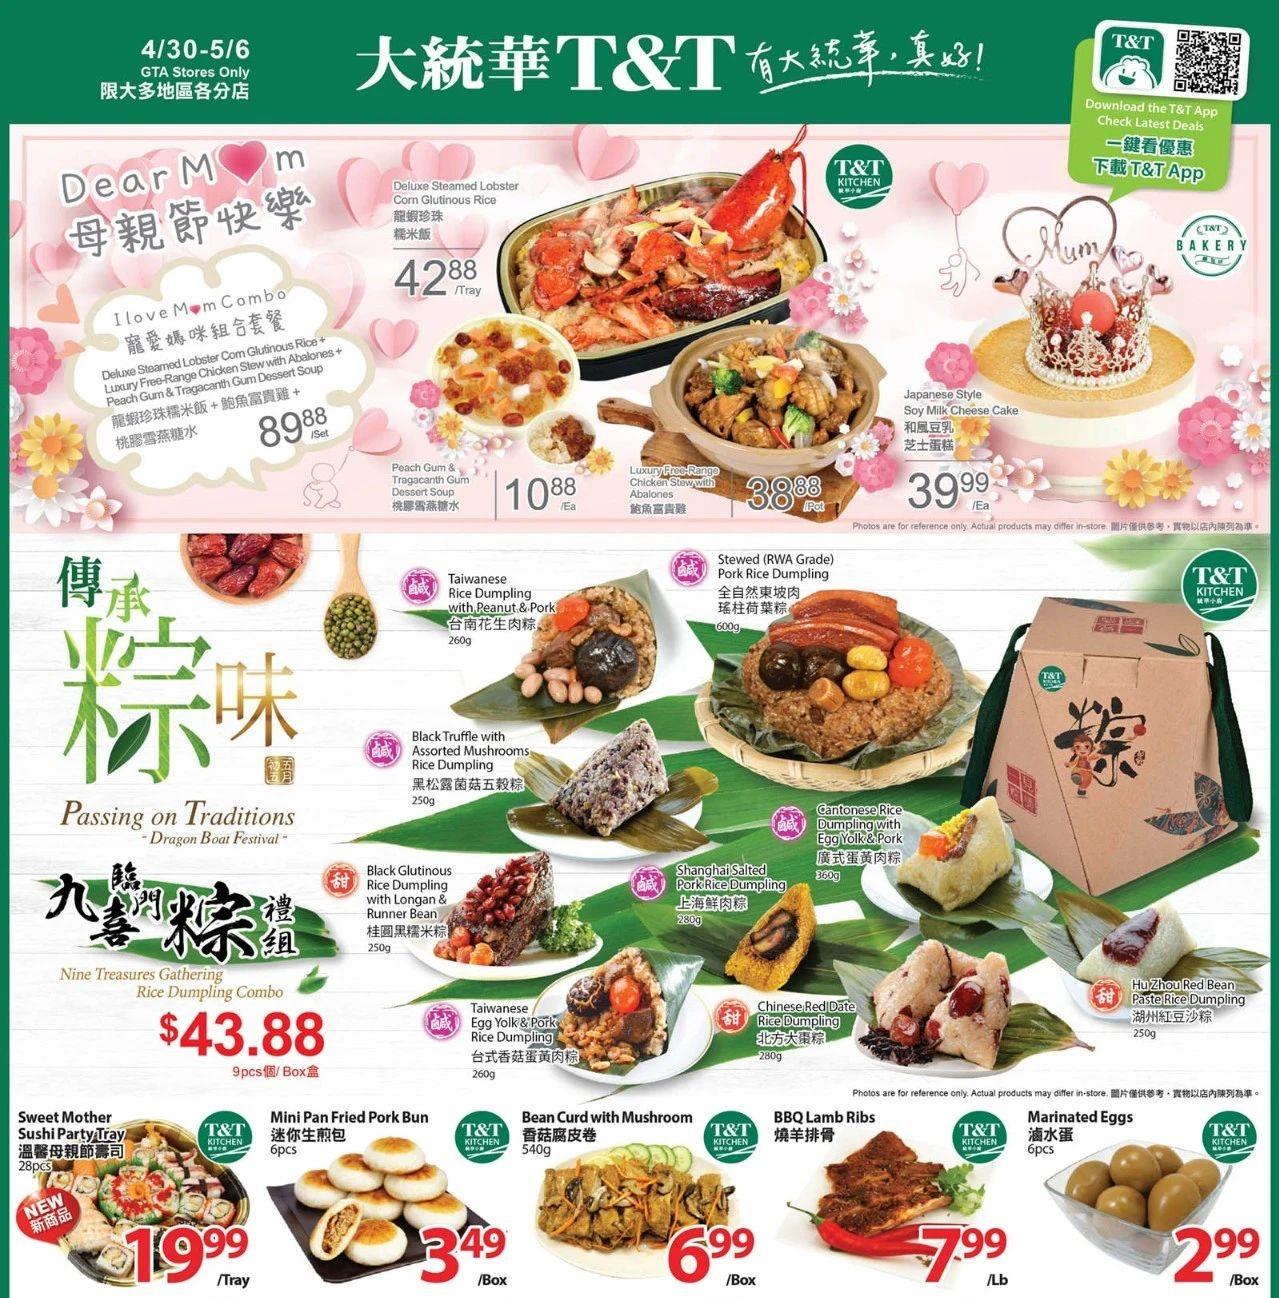 TNT Supermarket GTA Flyer Apr 30